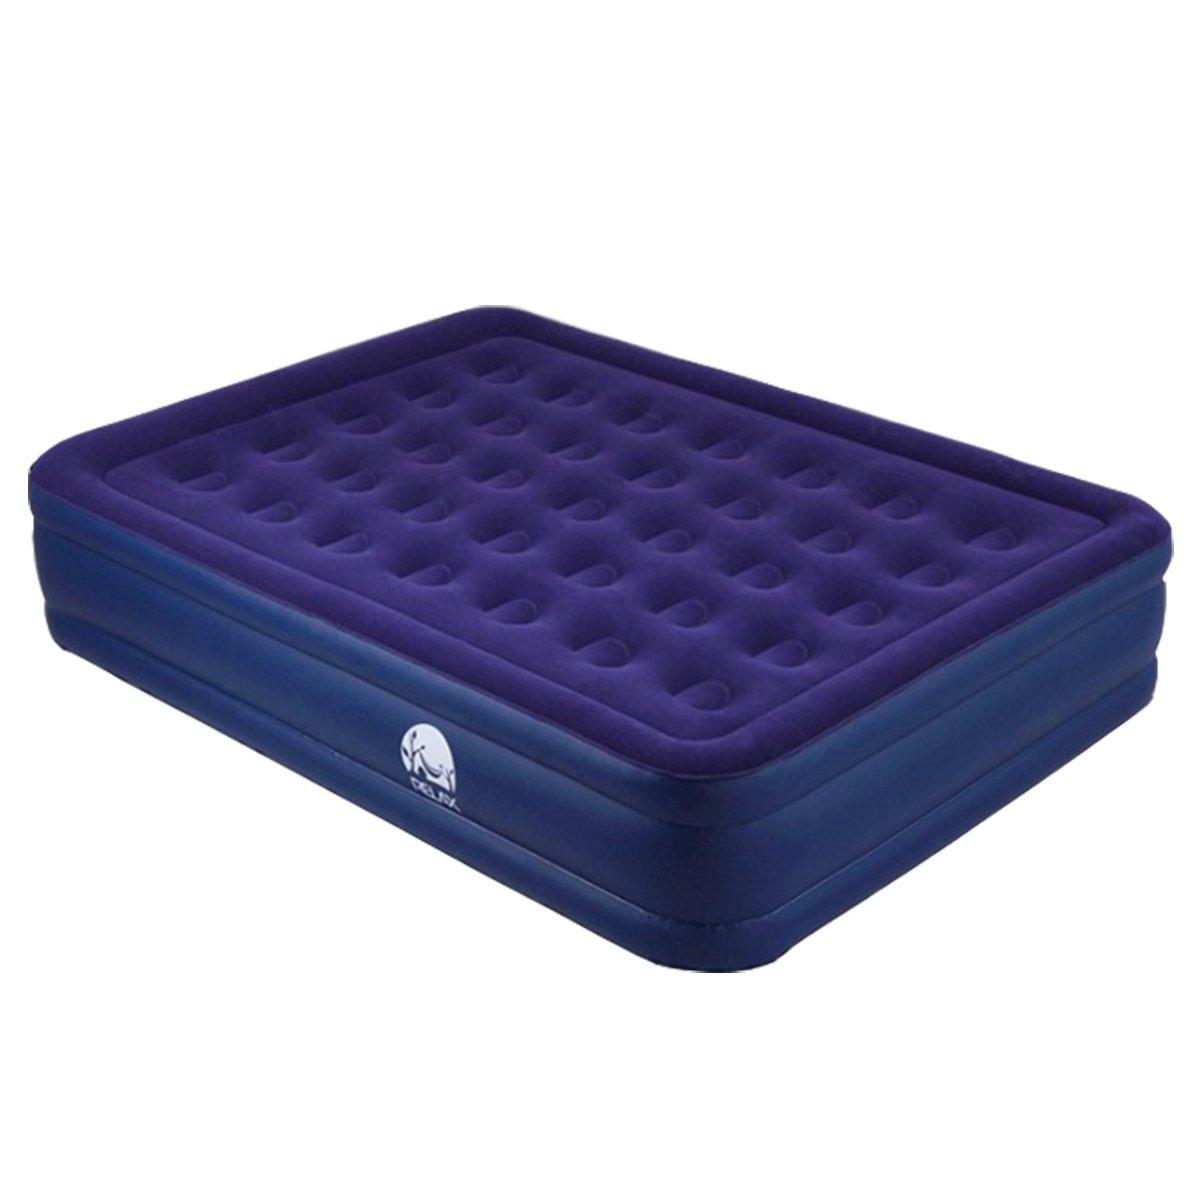 ALASKA2YOU Air mattress double built in pump 203x152x47cm